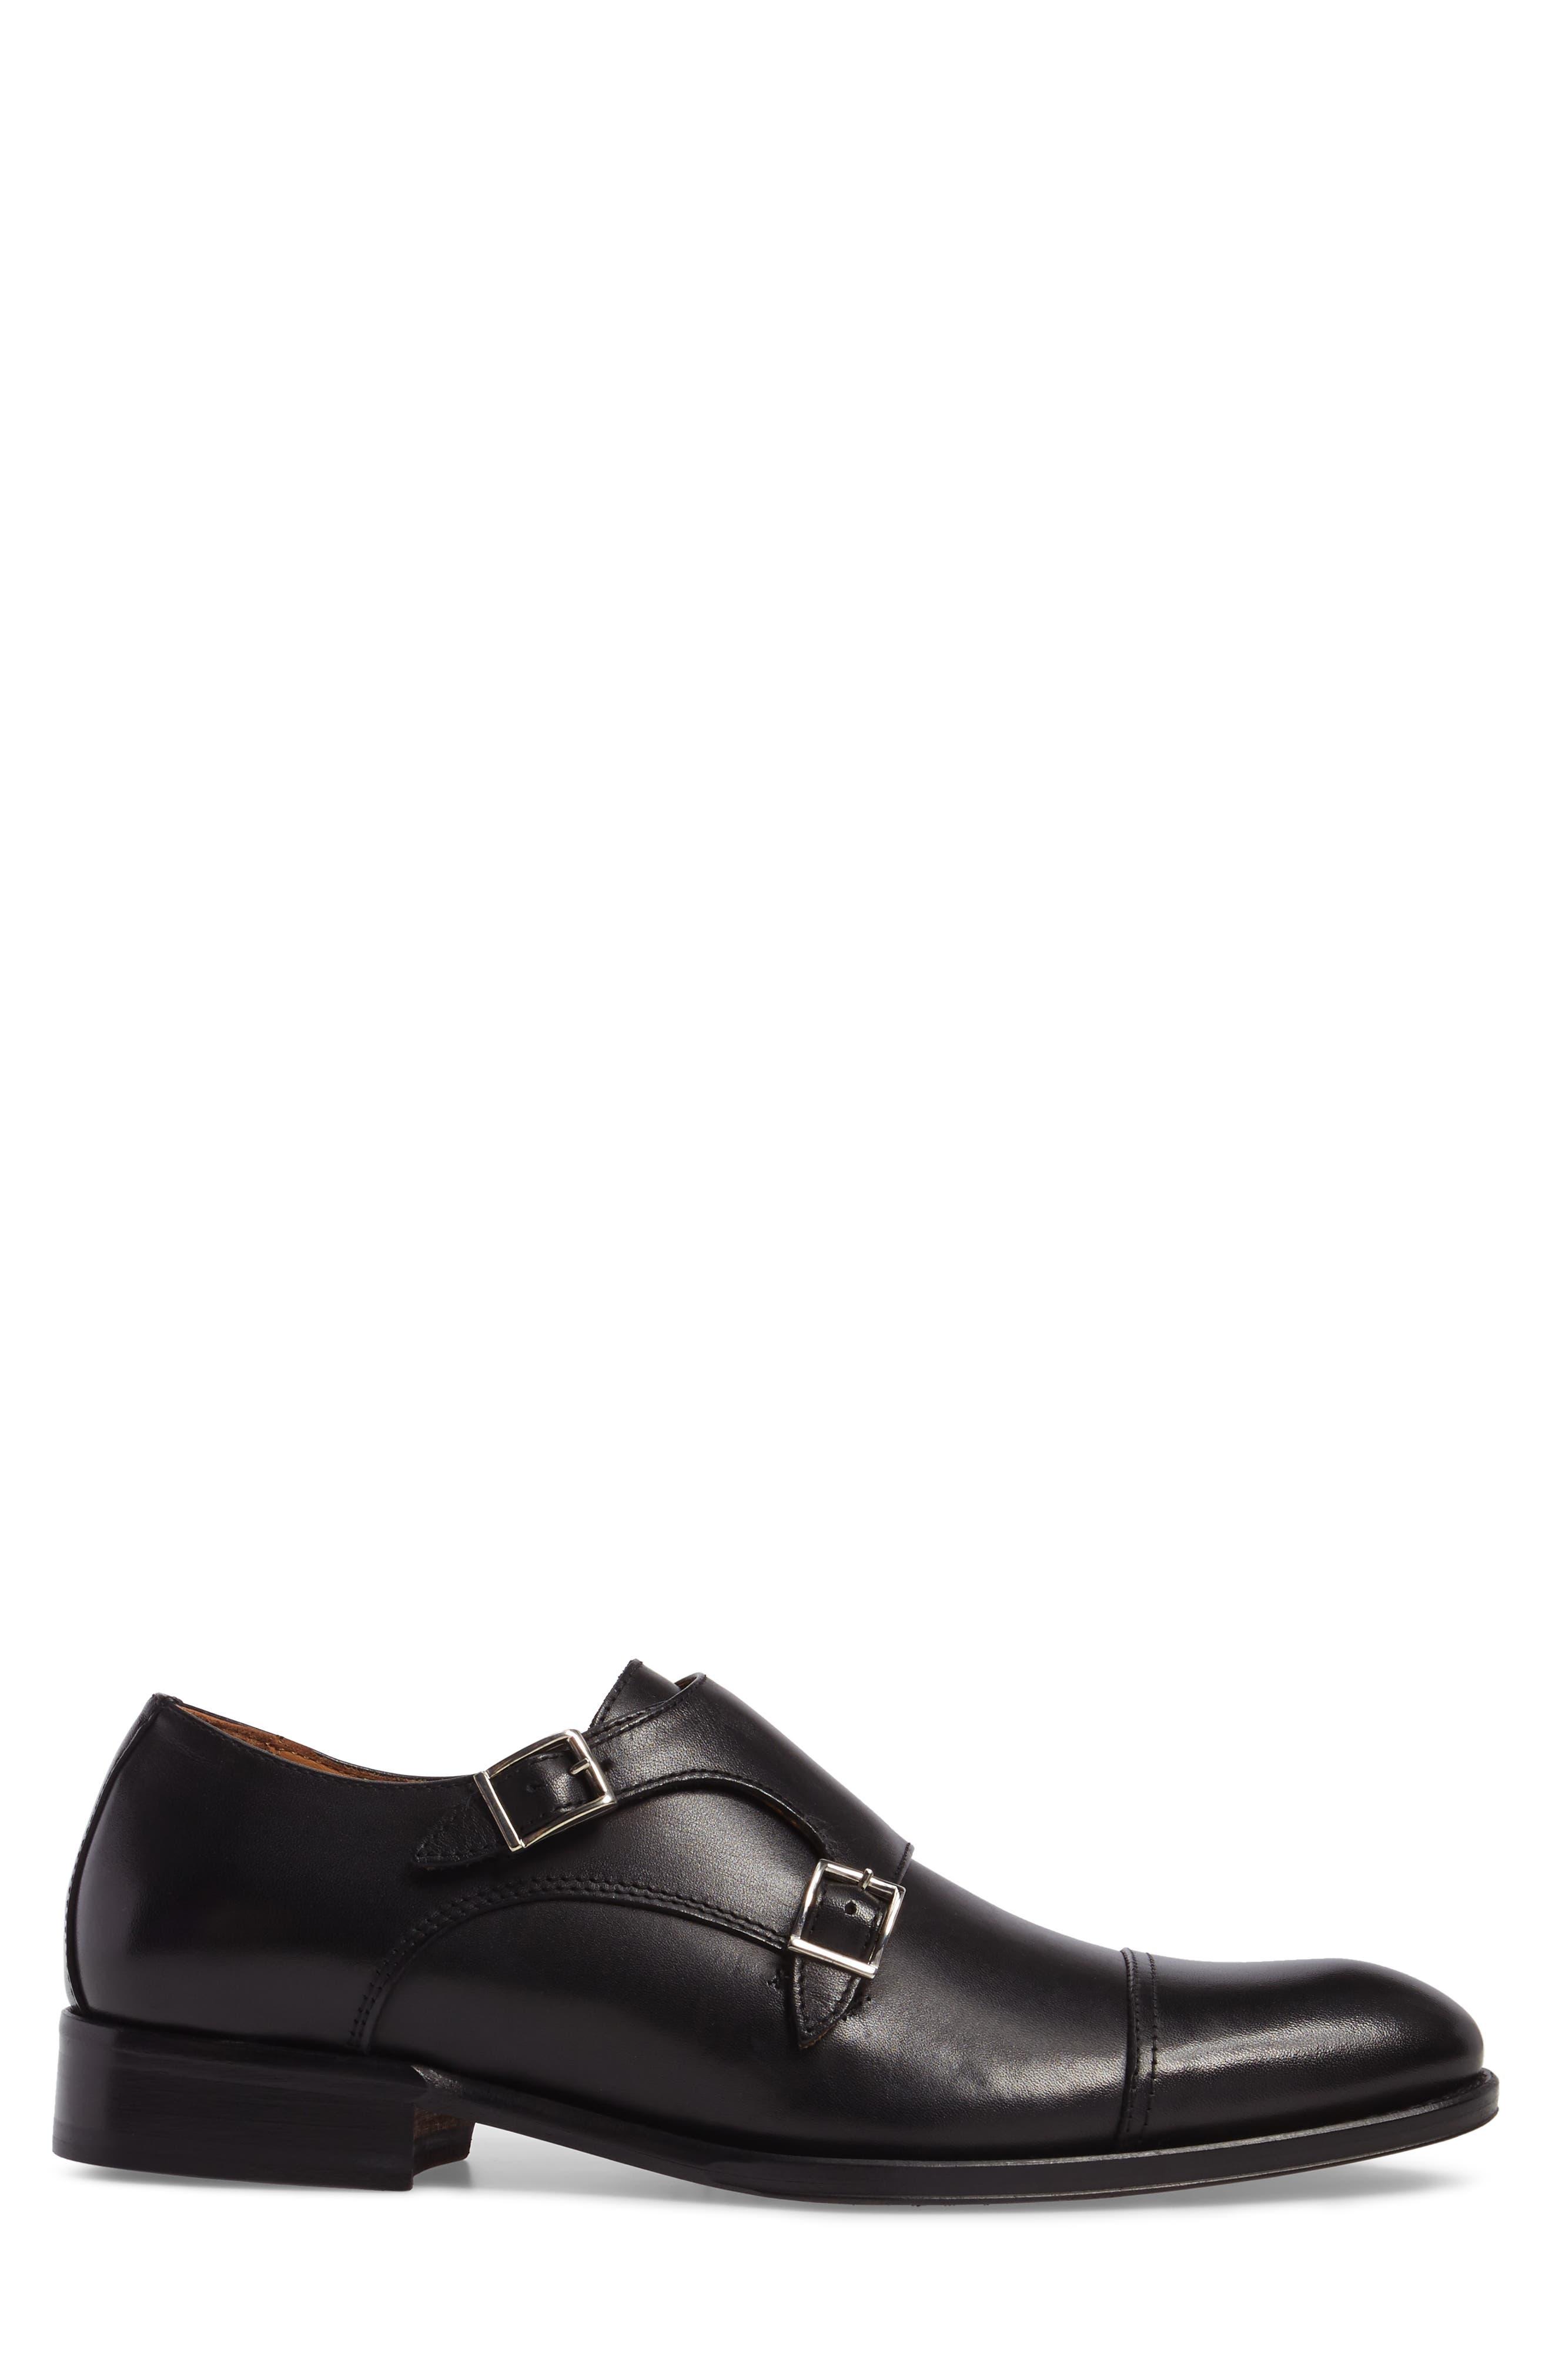 Alternate Image 3  - John W. Nordstrom® Stratton Double Monk Strap Shoe (Men)